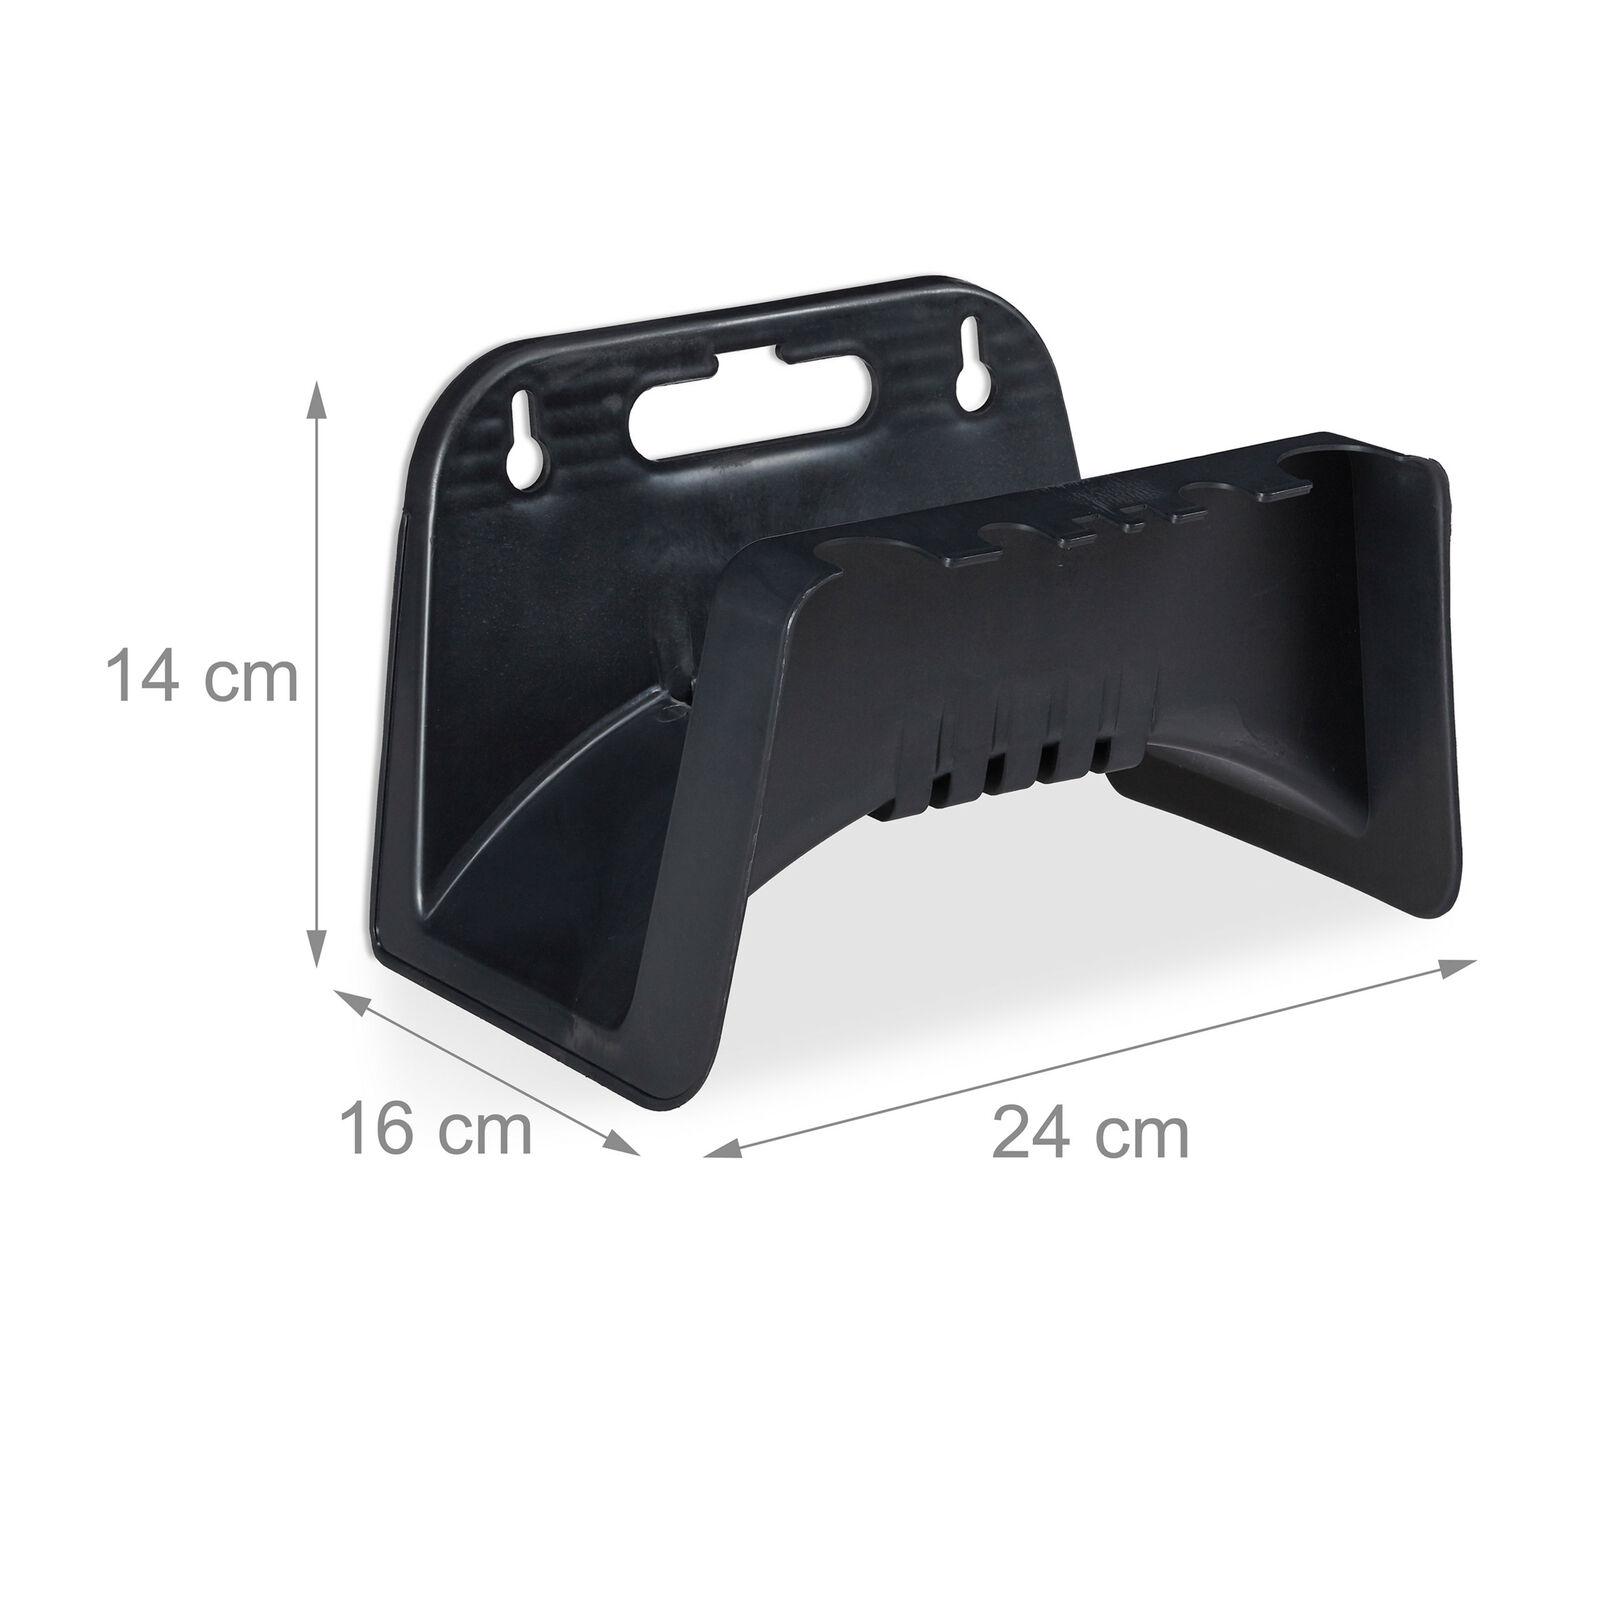 10 x Hose Holder Wall-mounted Hosepipe Holder Garden Hose Holder Plastic Simple